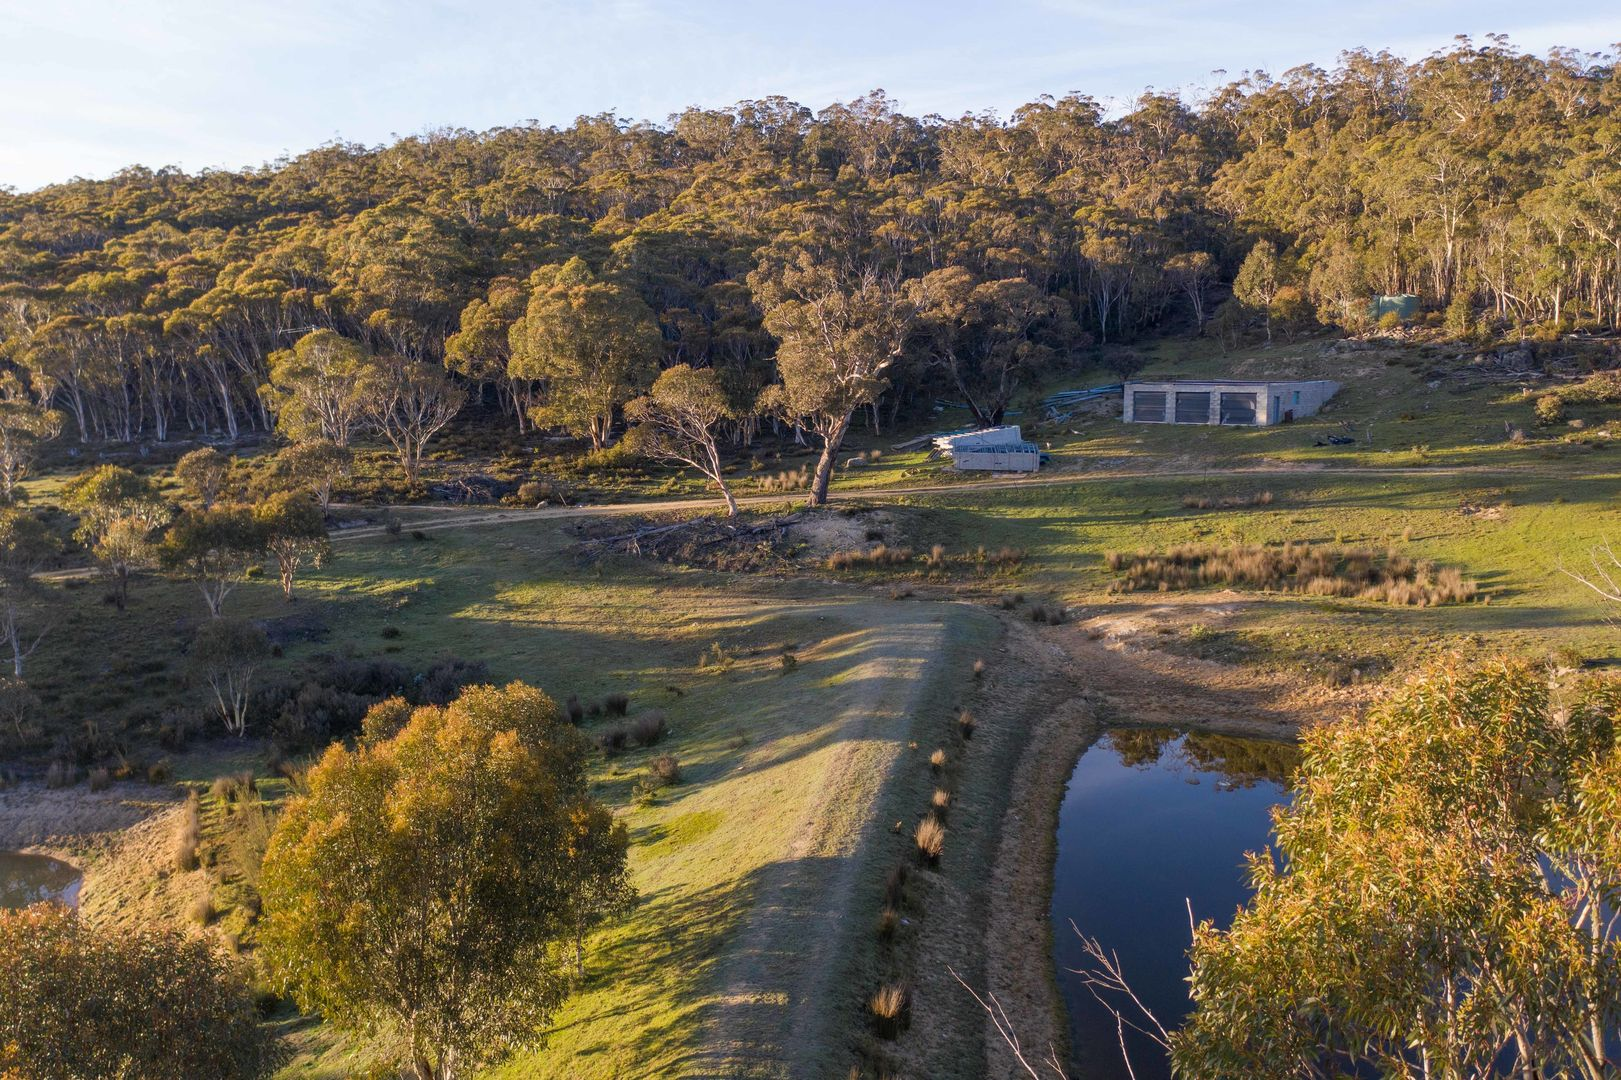 69 Old Grosses Rd, Ingebirah NSW 2627, Image 1